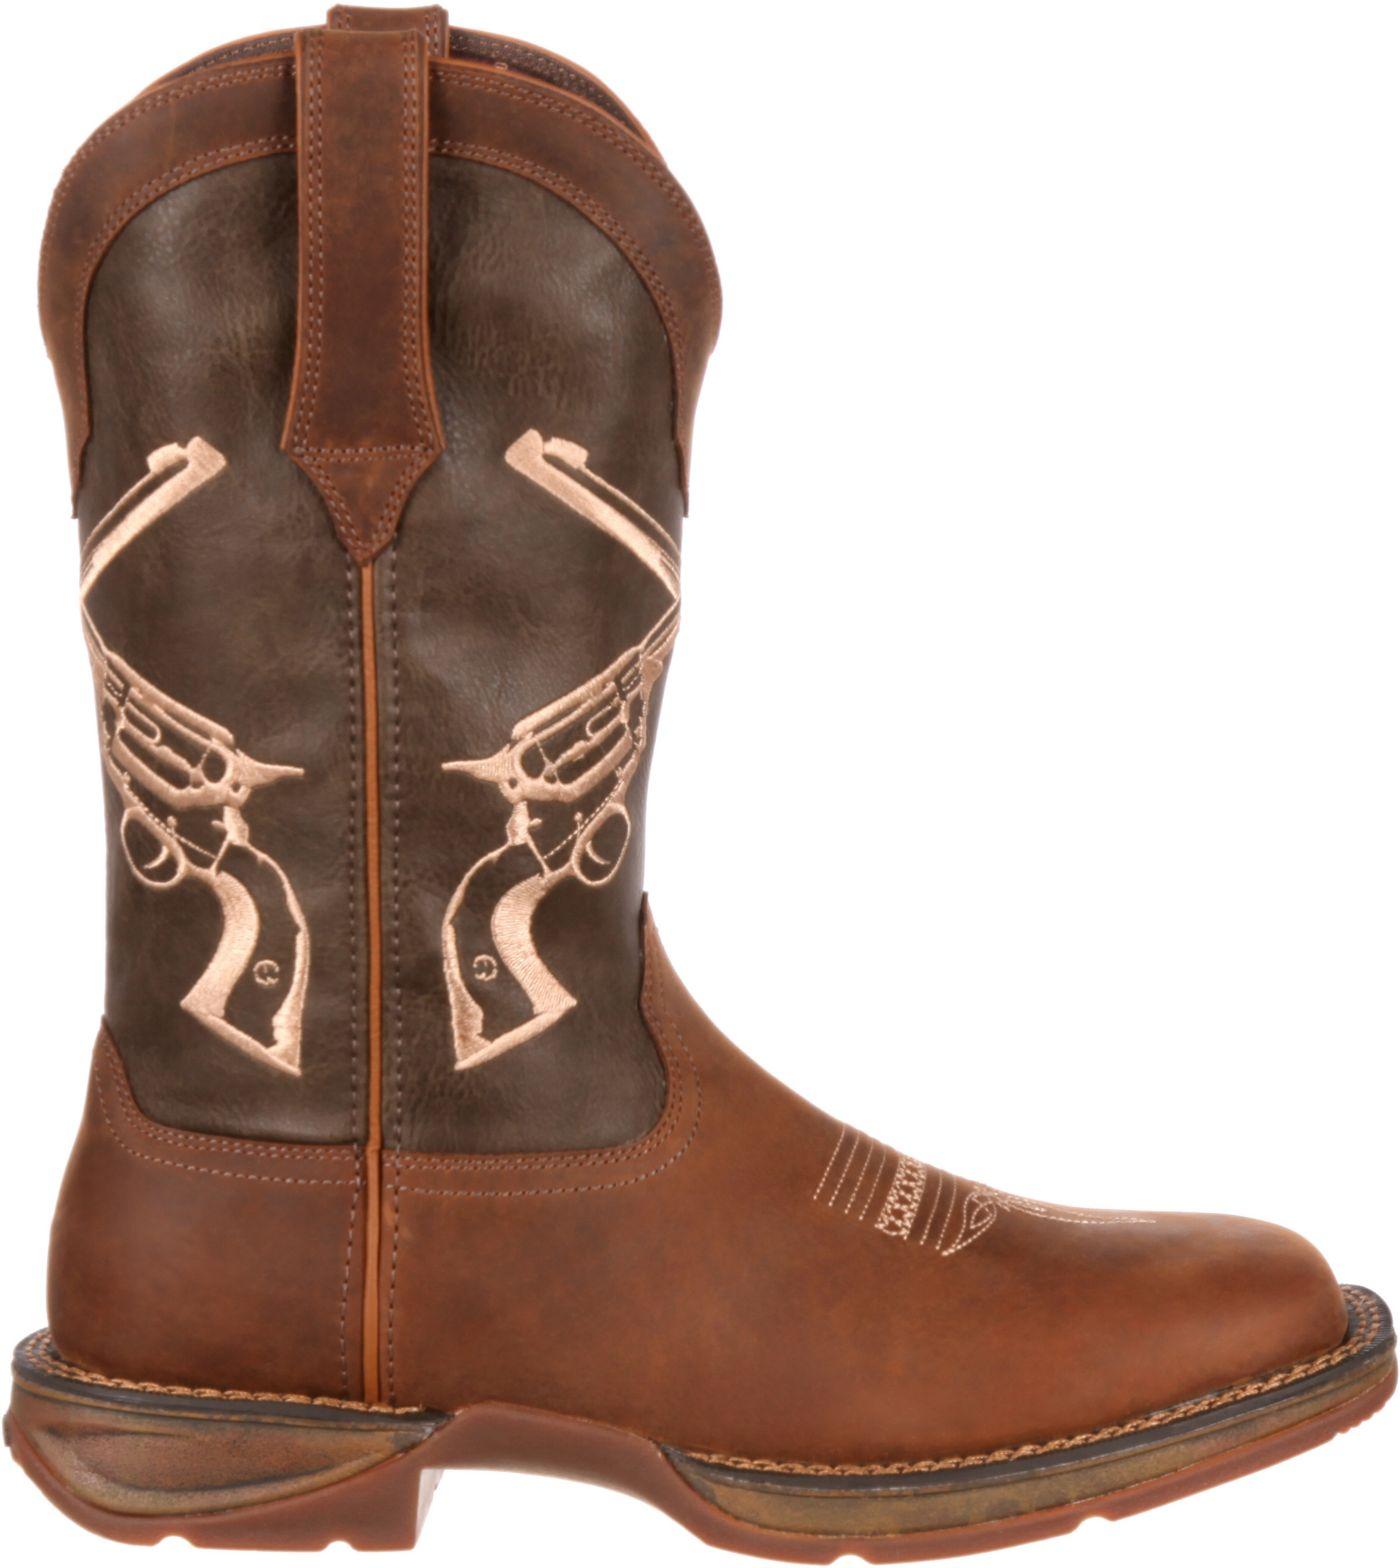 Durango Men's Rebel Faded Union Flag Western Boots